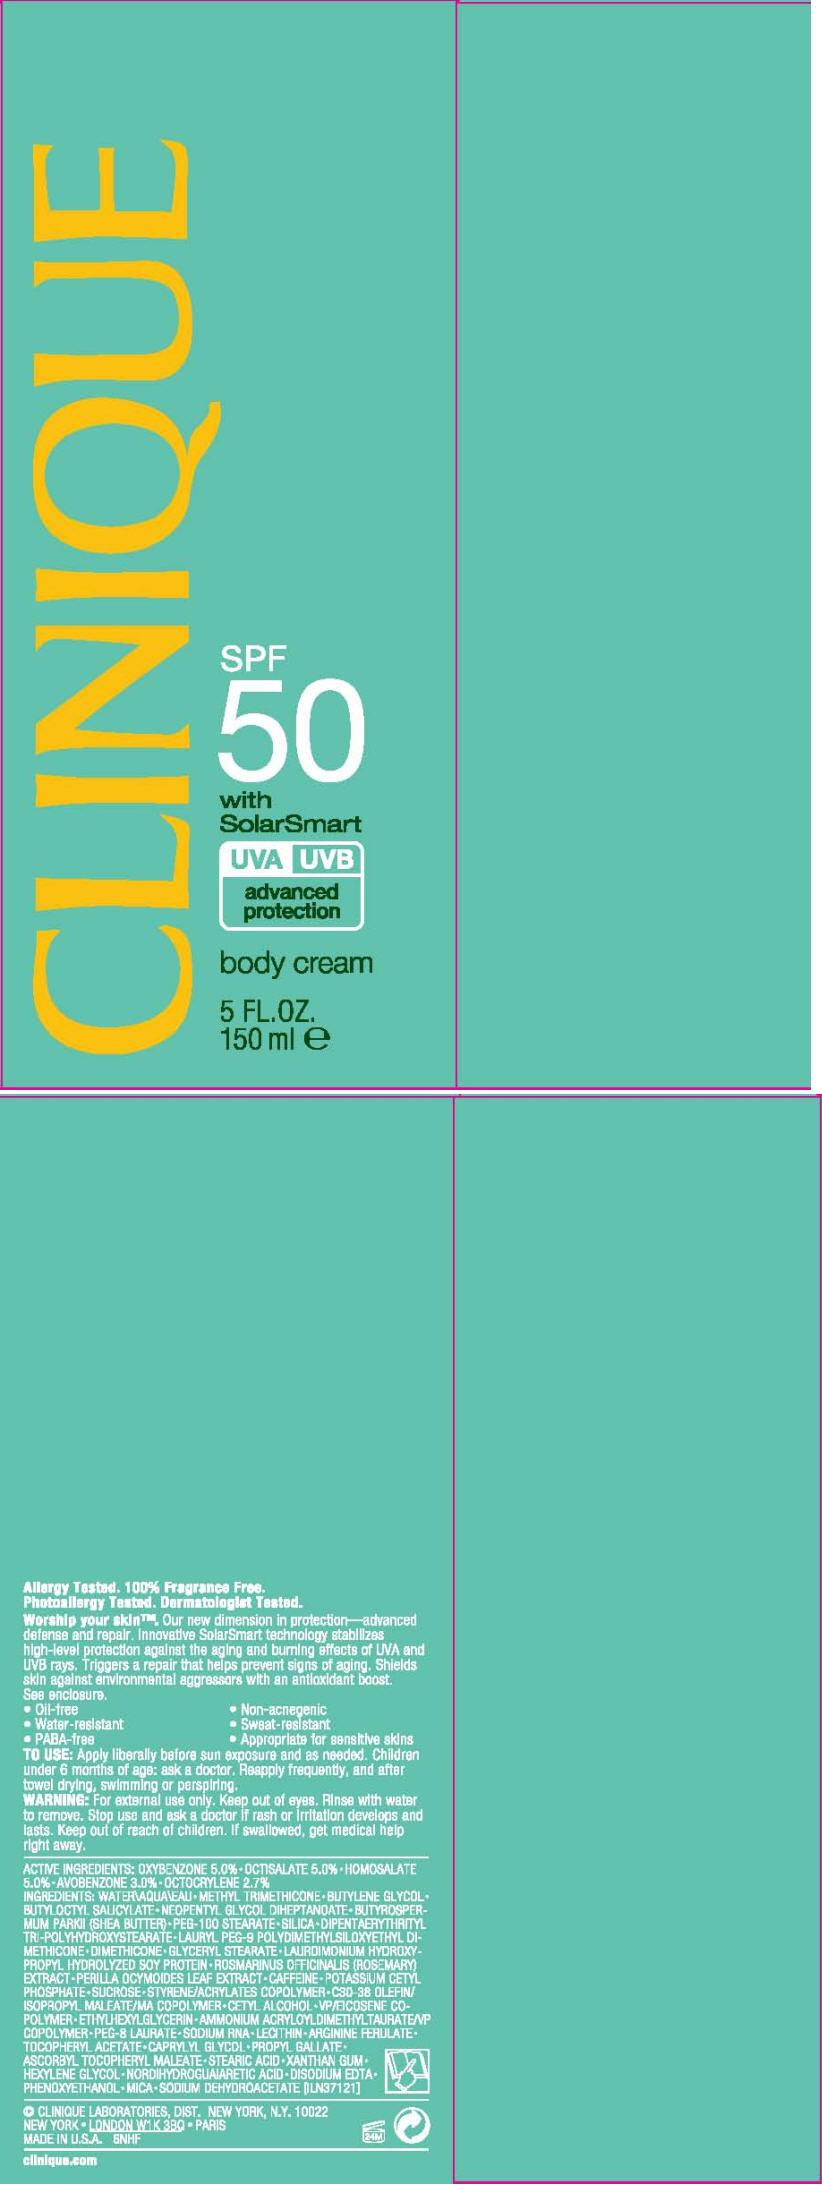 Clinique (Oxybenzone, Octisalate, Homosalate, Avobenzone, And Octocrylene) Cream [Clinique Laboratories Inc.]